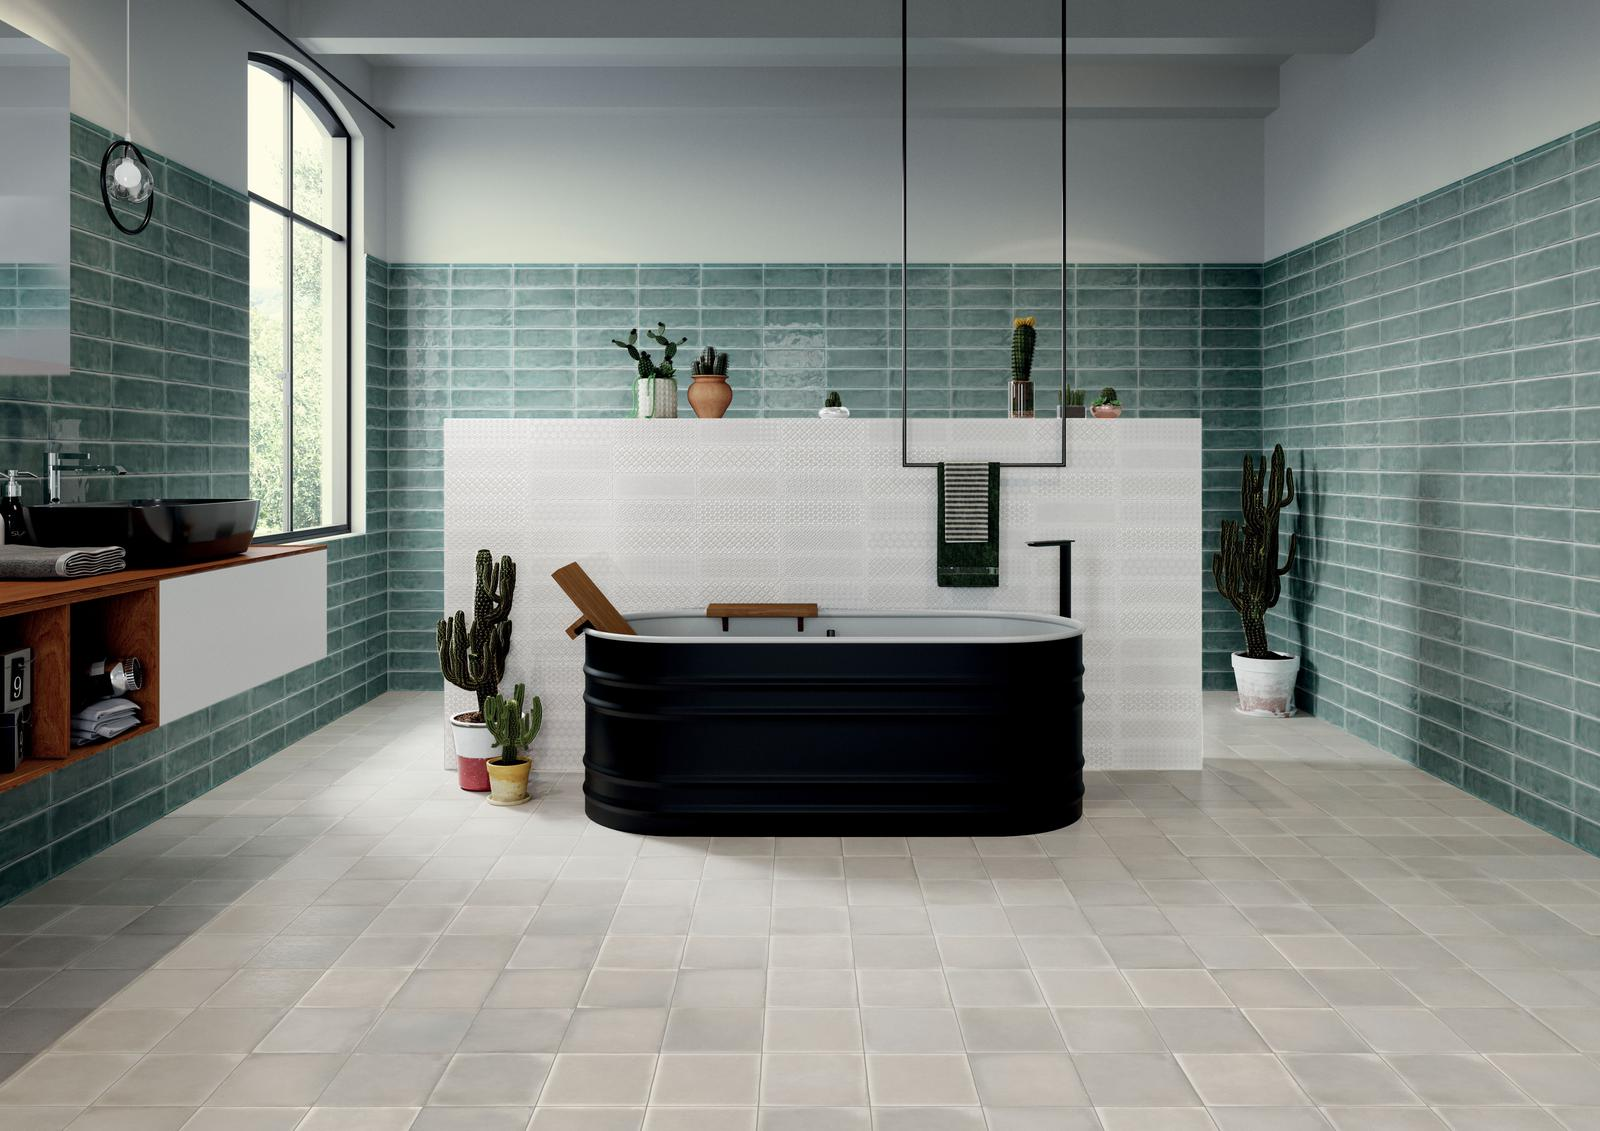 Zelená v kúpeľni - Obrázok č. 14